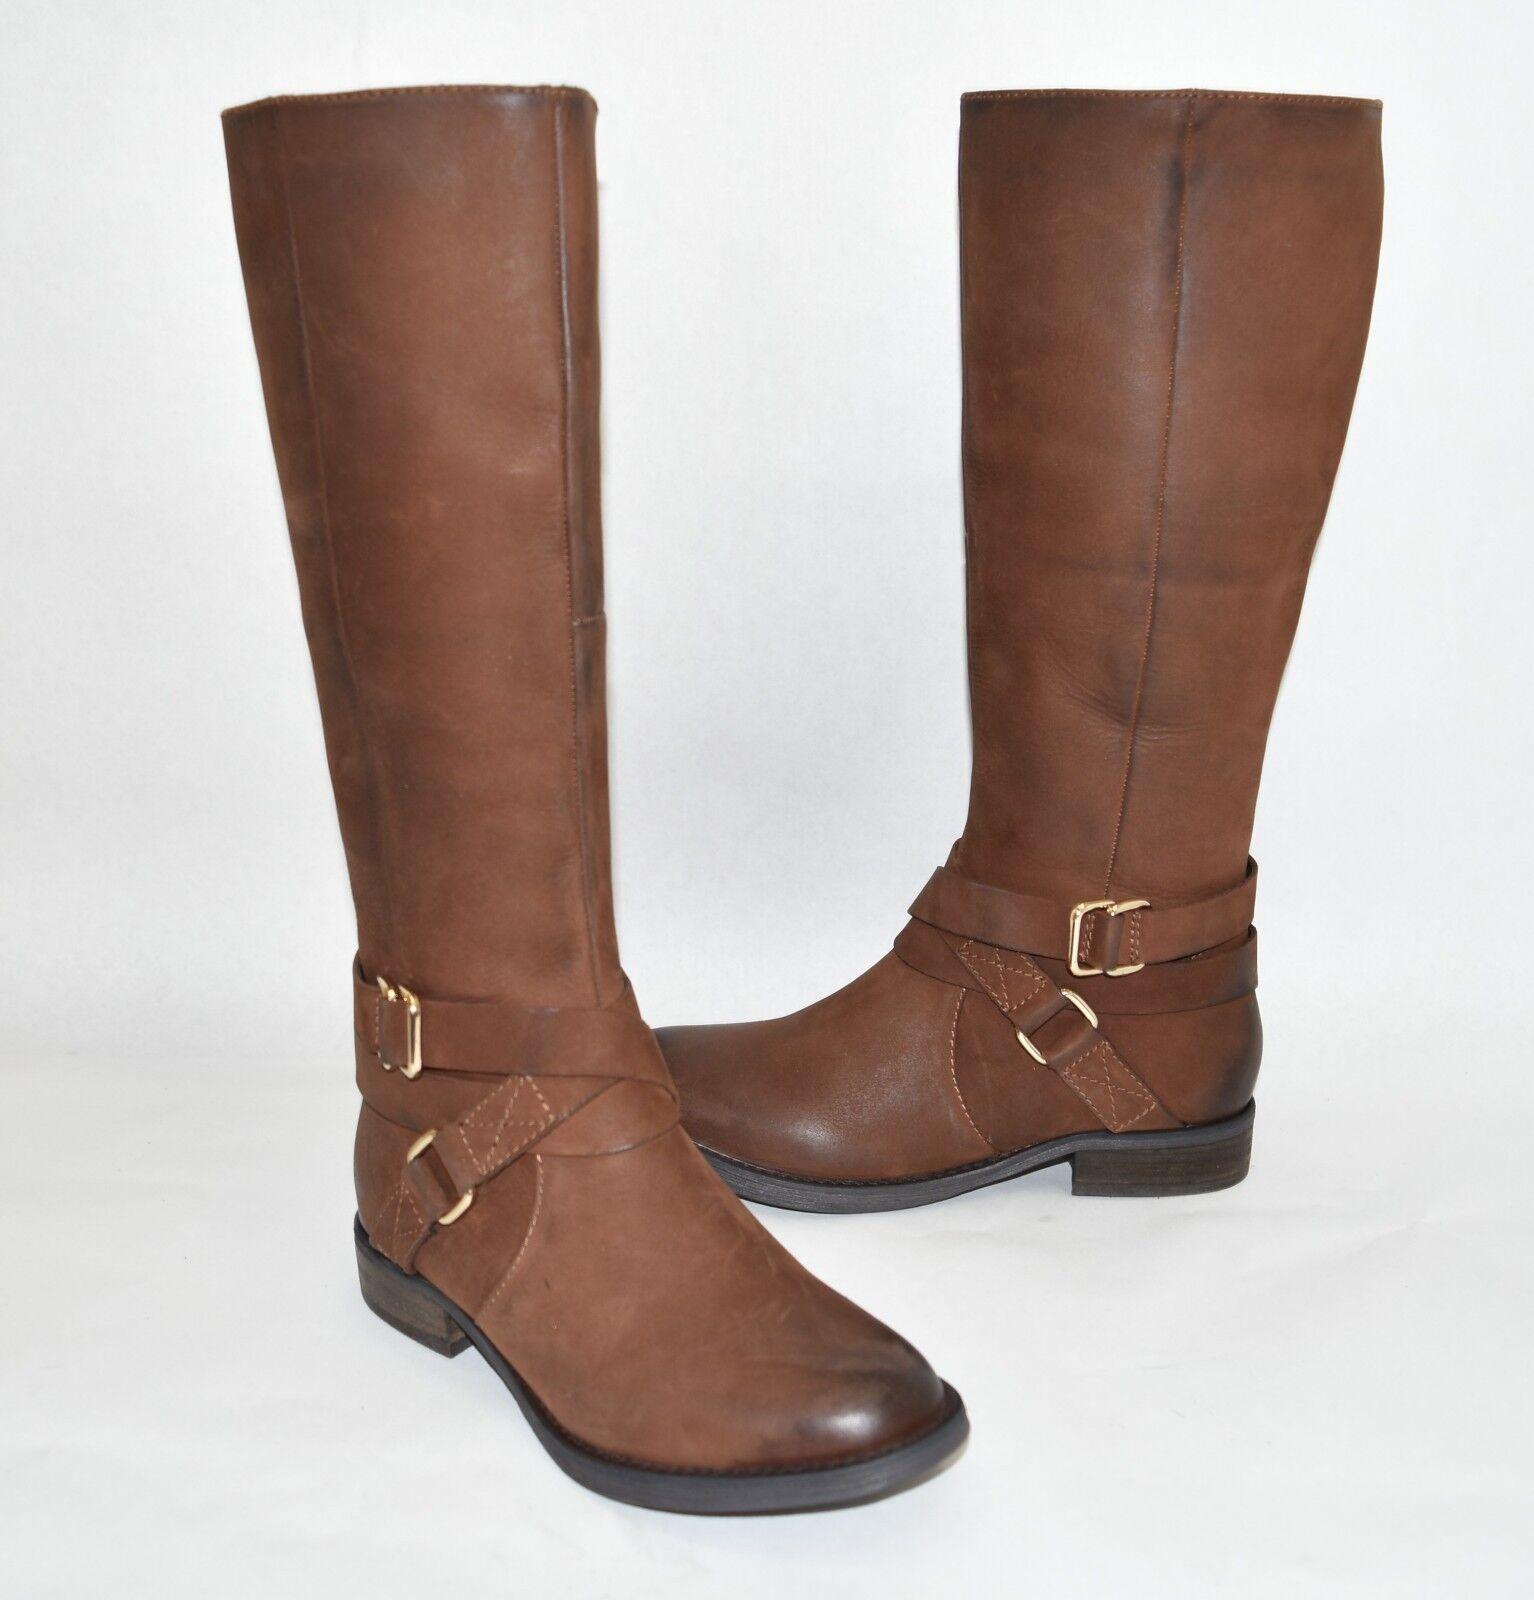 New    Blondo Nevo Waterproof Tall Riding Boot Brown Nubuck Leather B5347 Size 6.5 1ed8f4